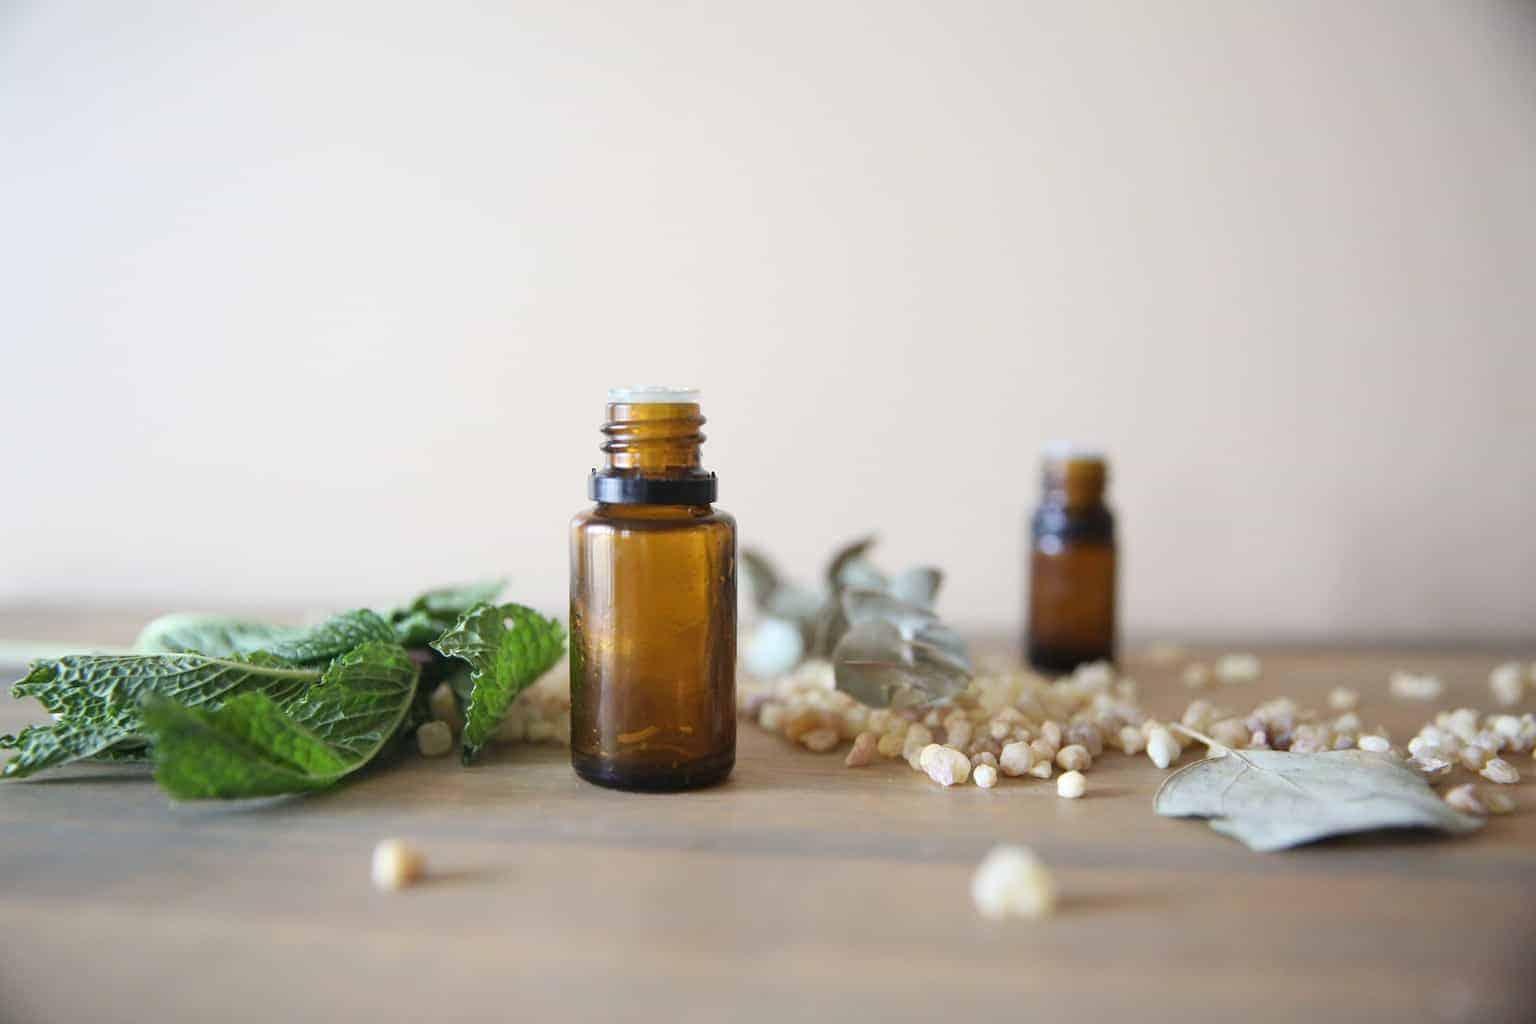 Myrrh essential oil diffuser blends and roller bottle recipes.